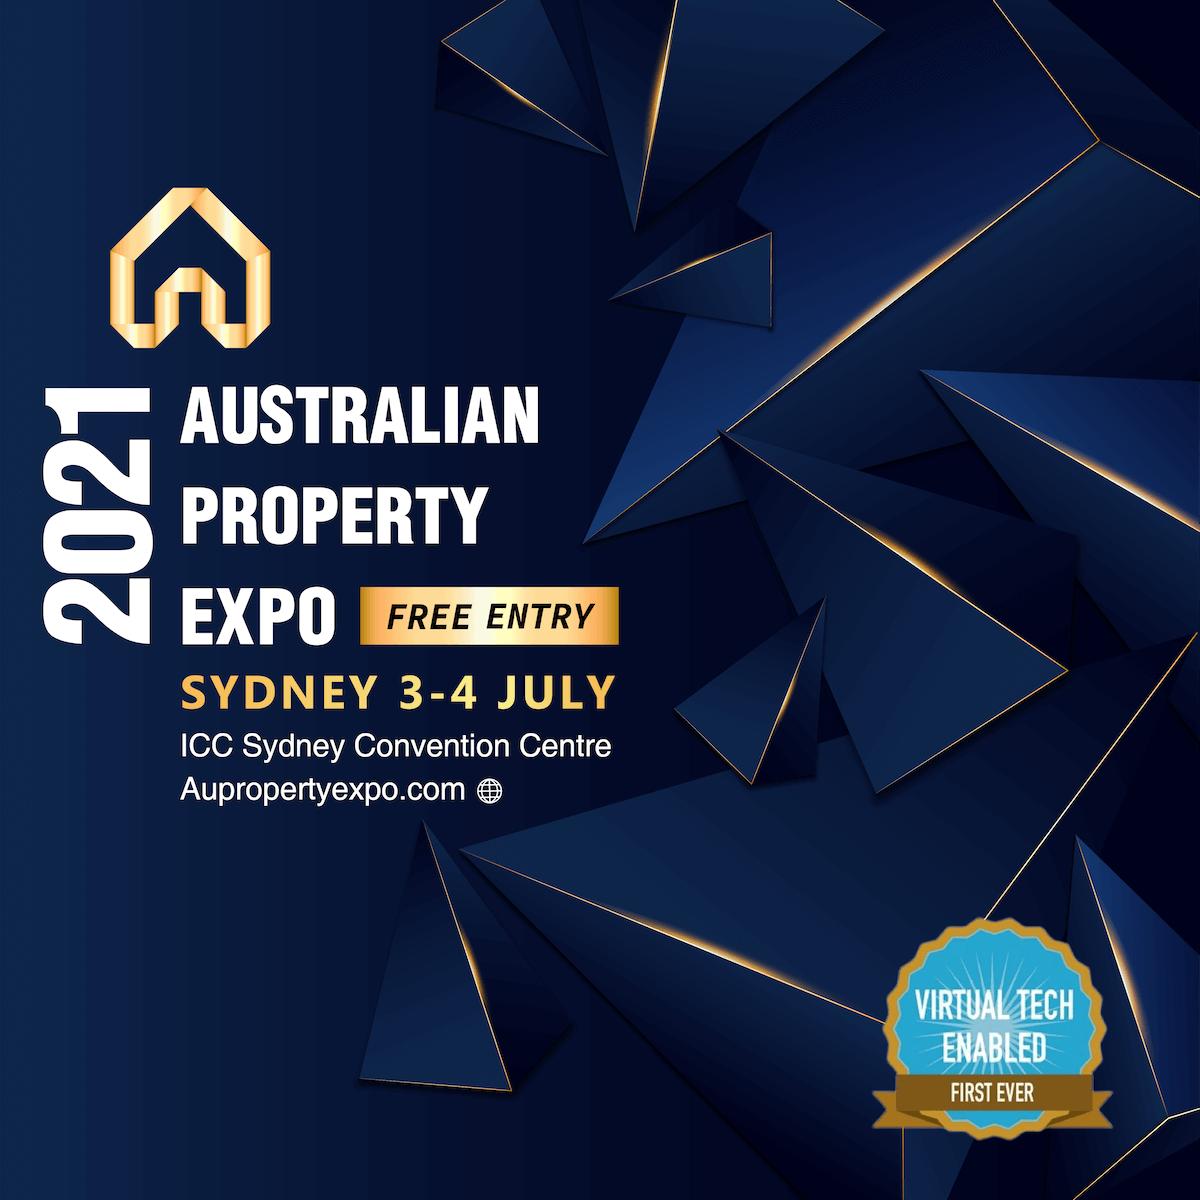 Australian Property Expo Sydney